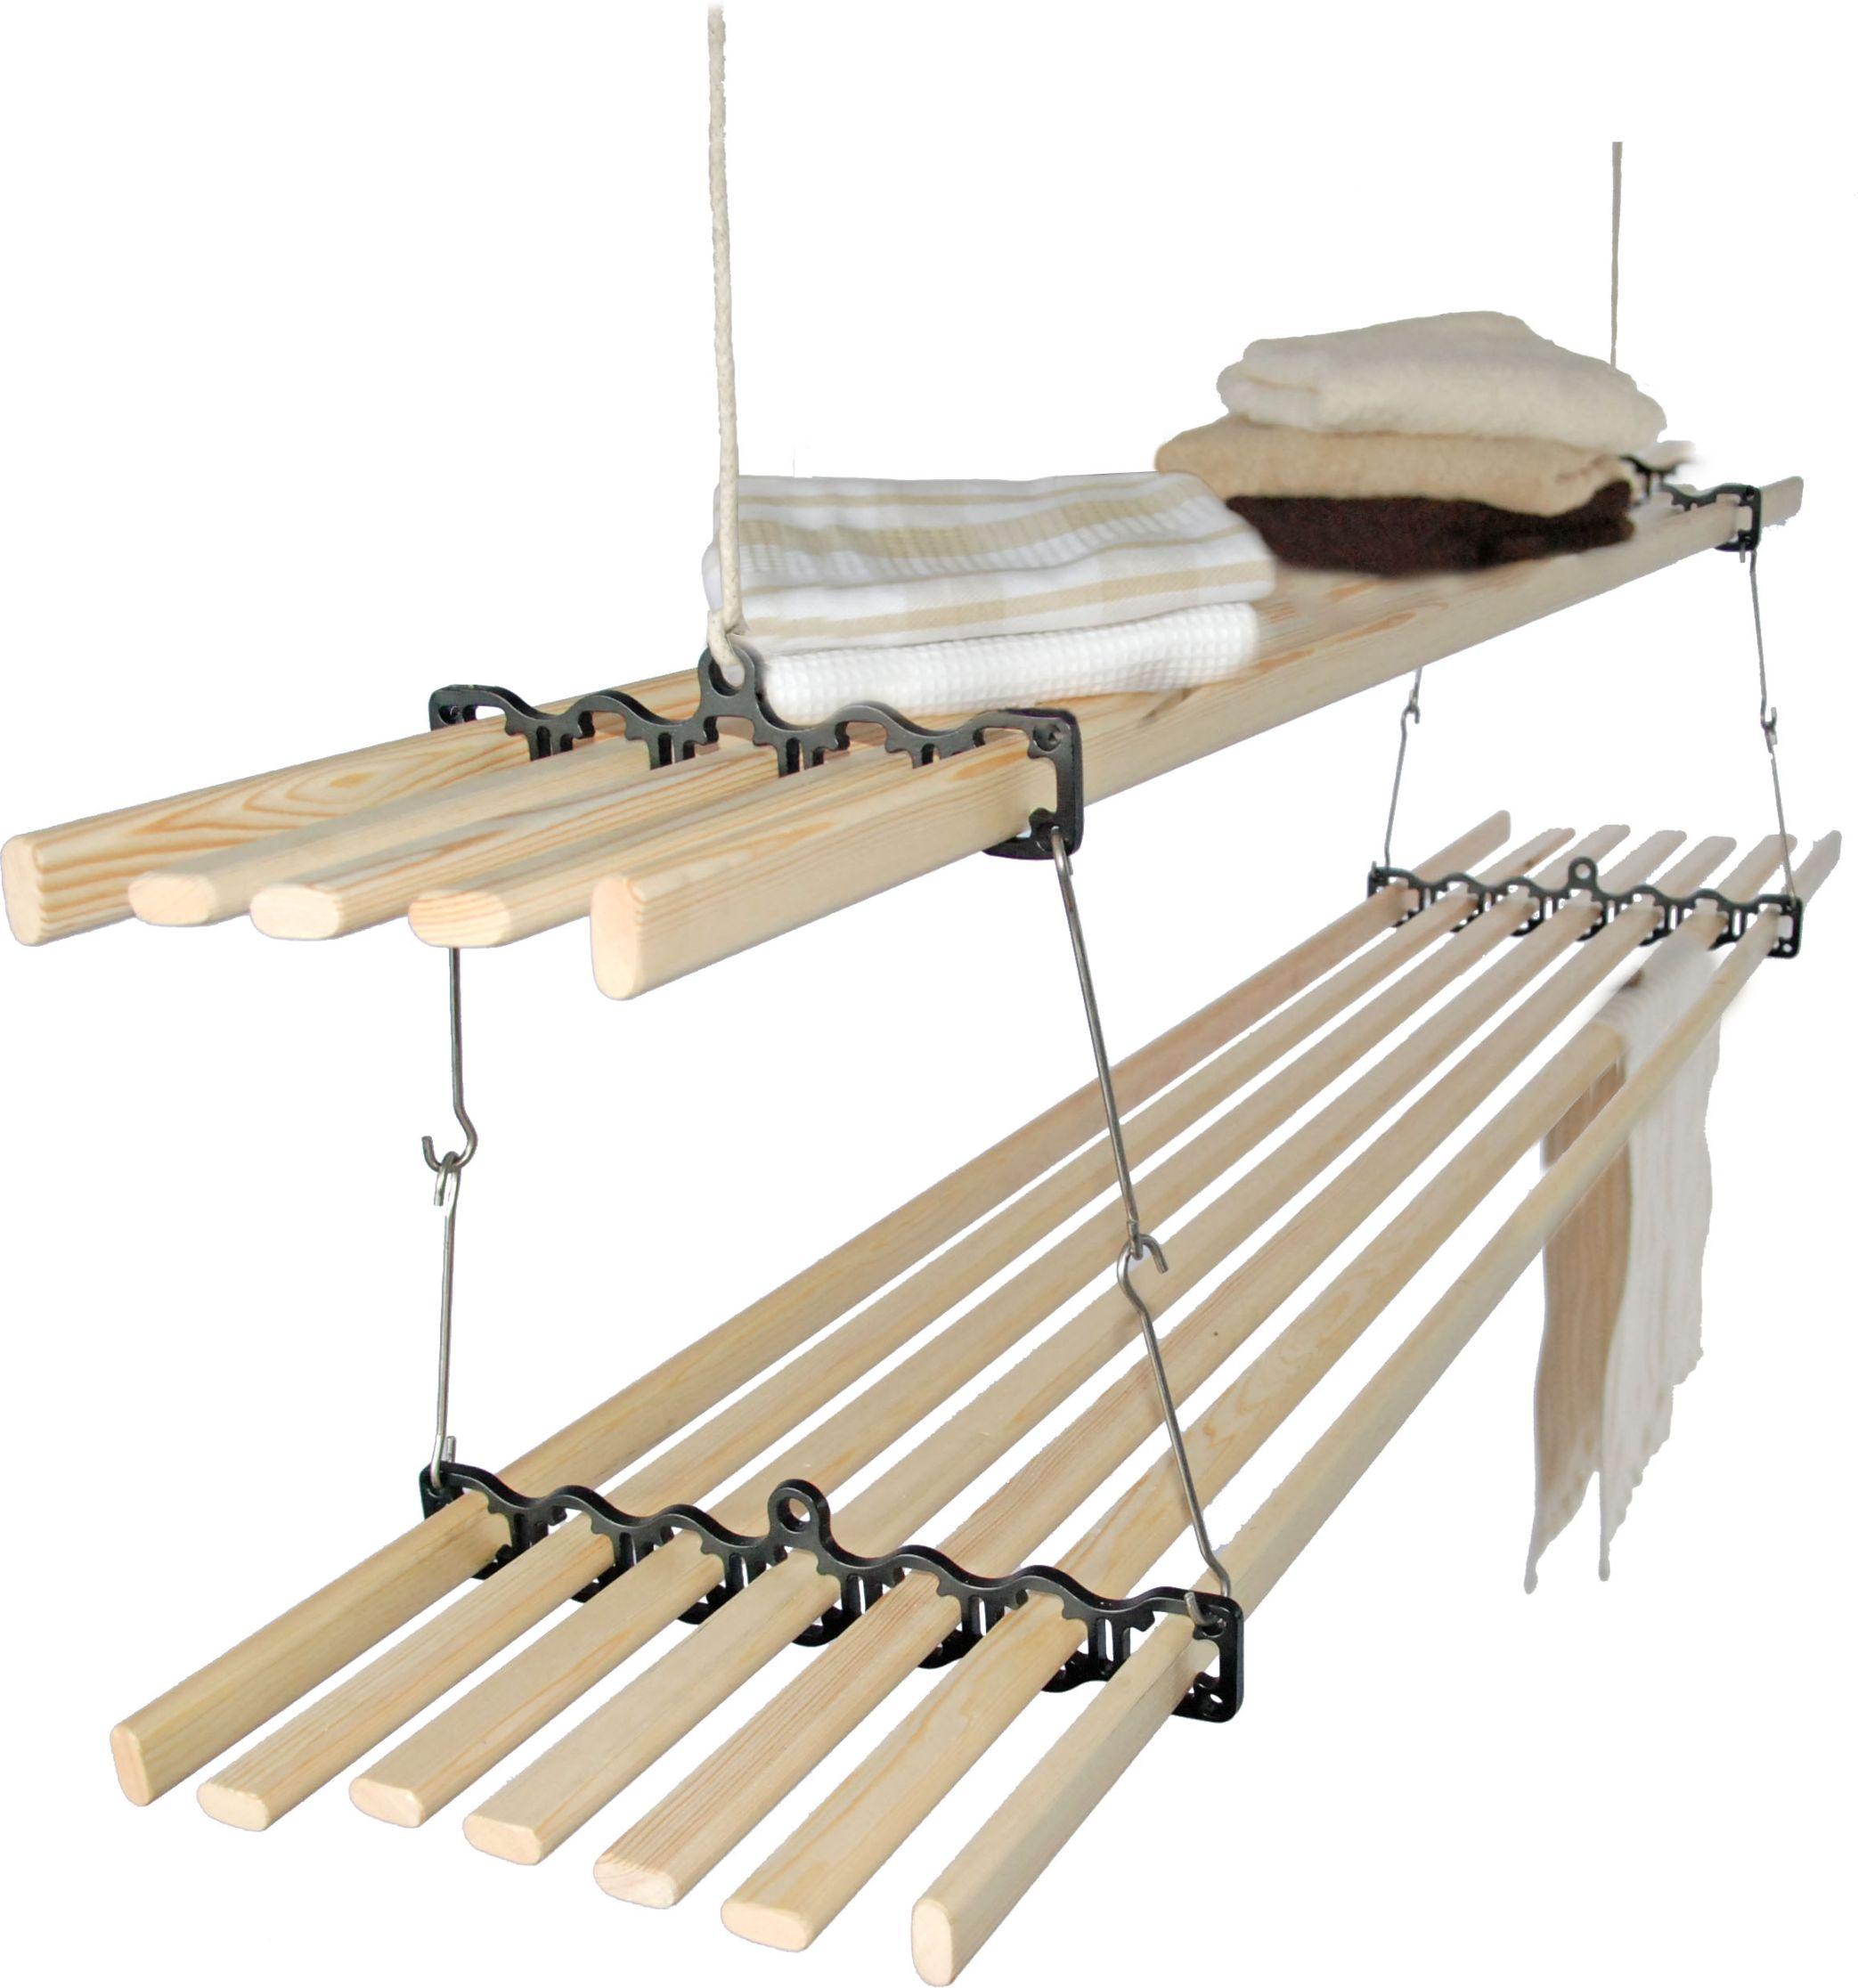 stacker gismo clothes airer urban clotheslines. Black Bedroom Furniture Sets. Home Design Ideas